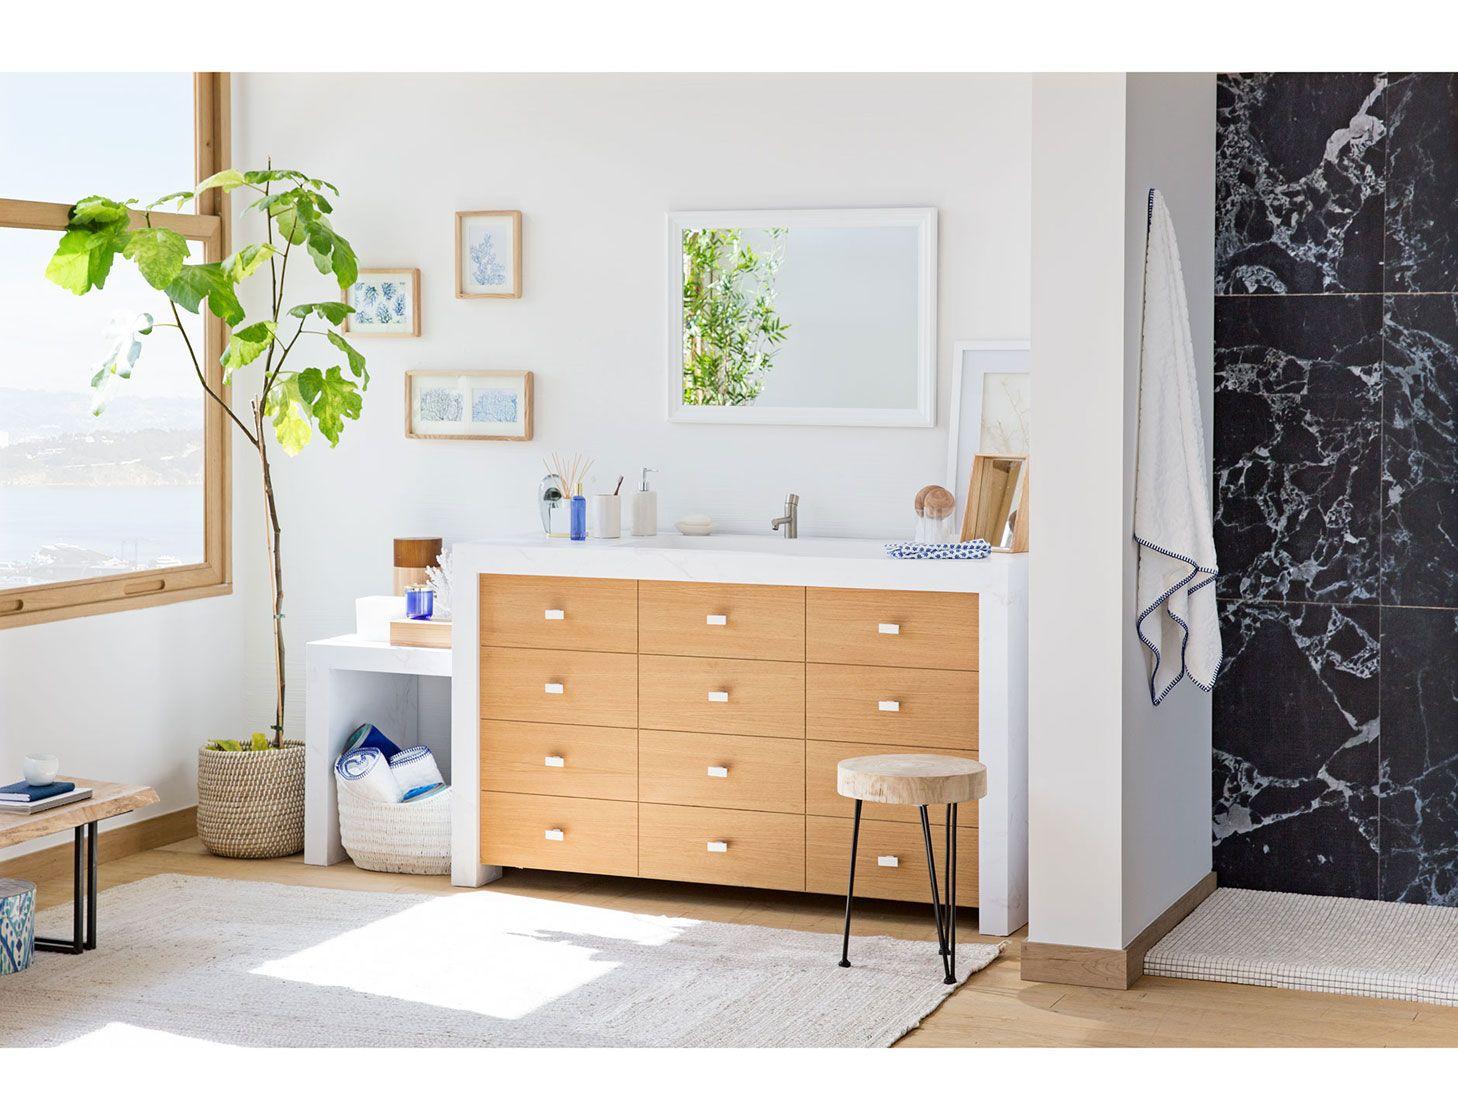 Jaipur - Shop the look | Zara Home United States of America | Bath ...